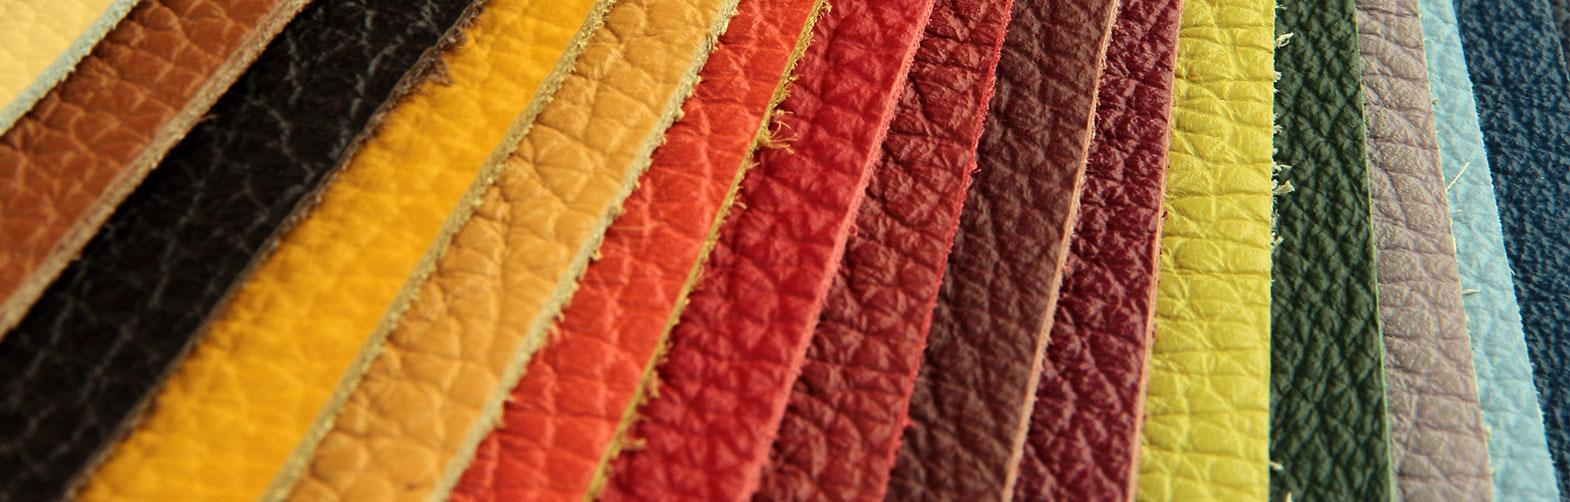 textiel-leder2_0.jpg